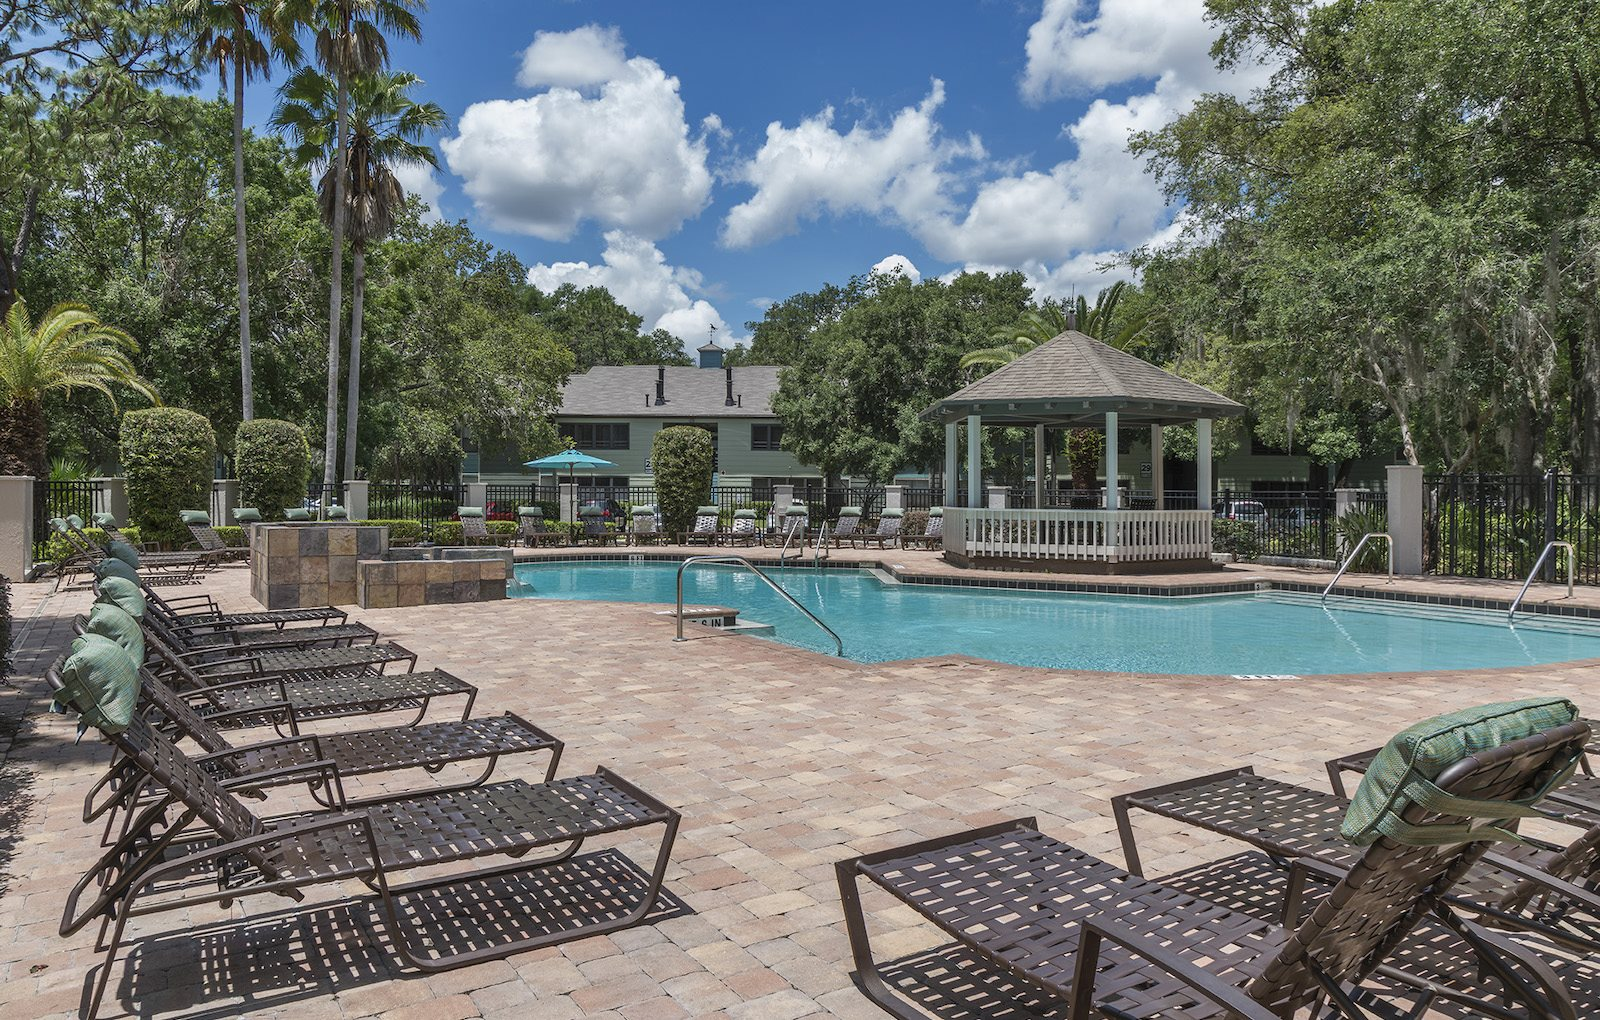 swimming pool with massive sundeck, chairs, gazebo, and lush trees at The Retreat at Lakeland Apartments, Lakeland